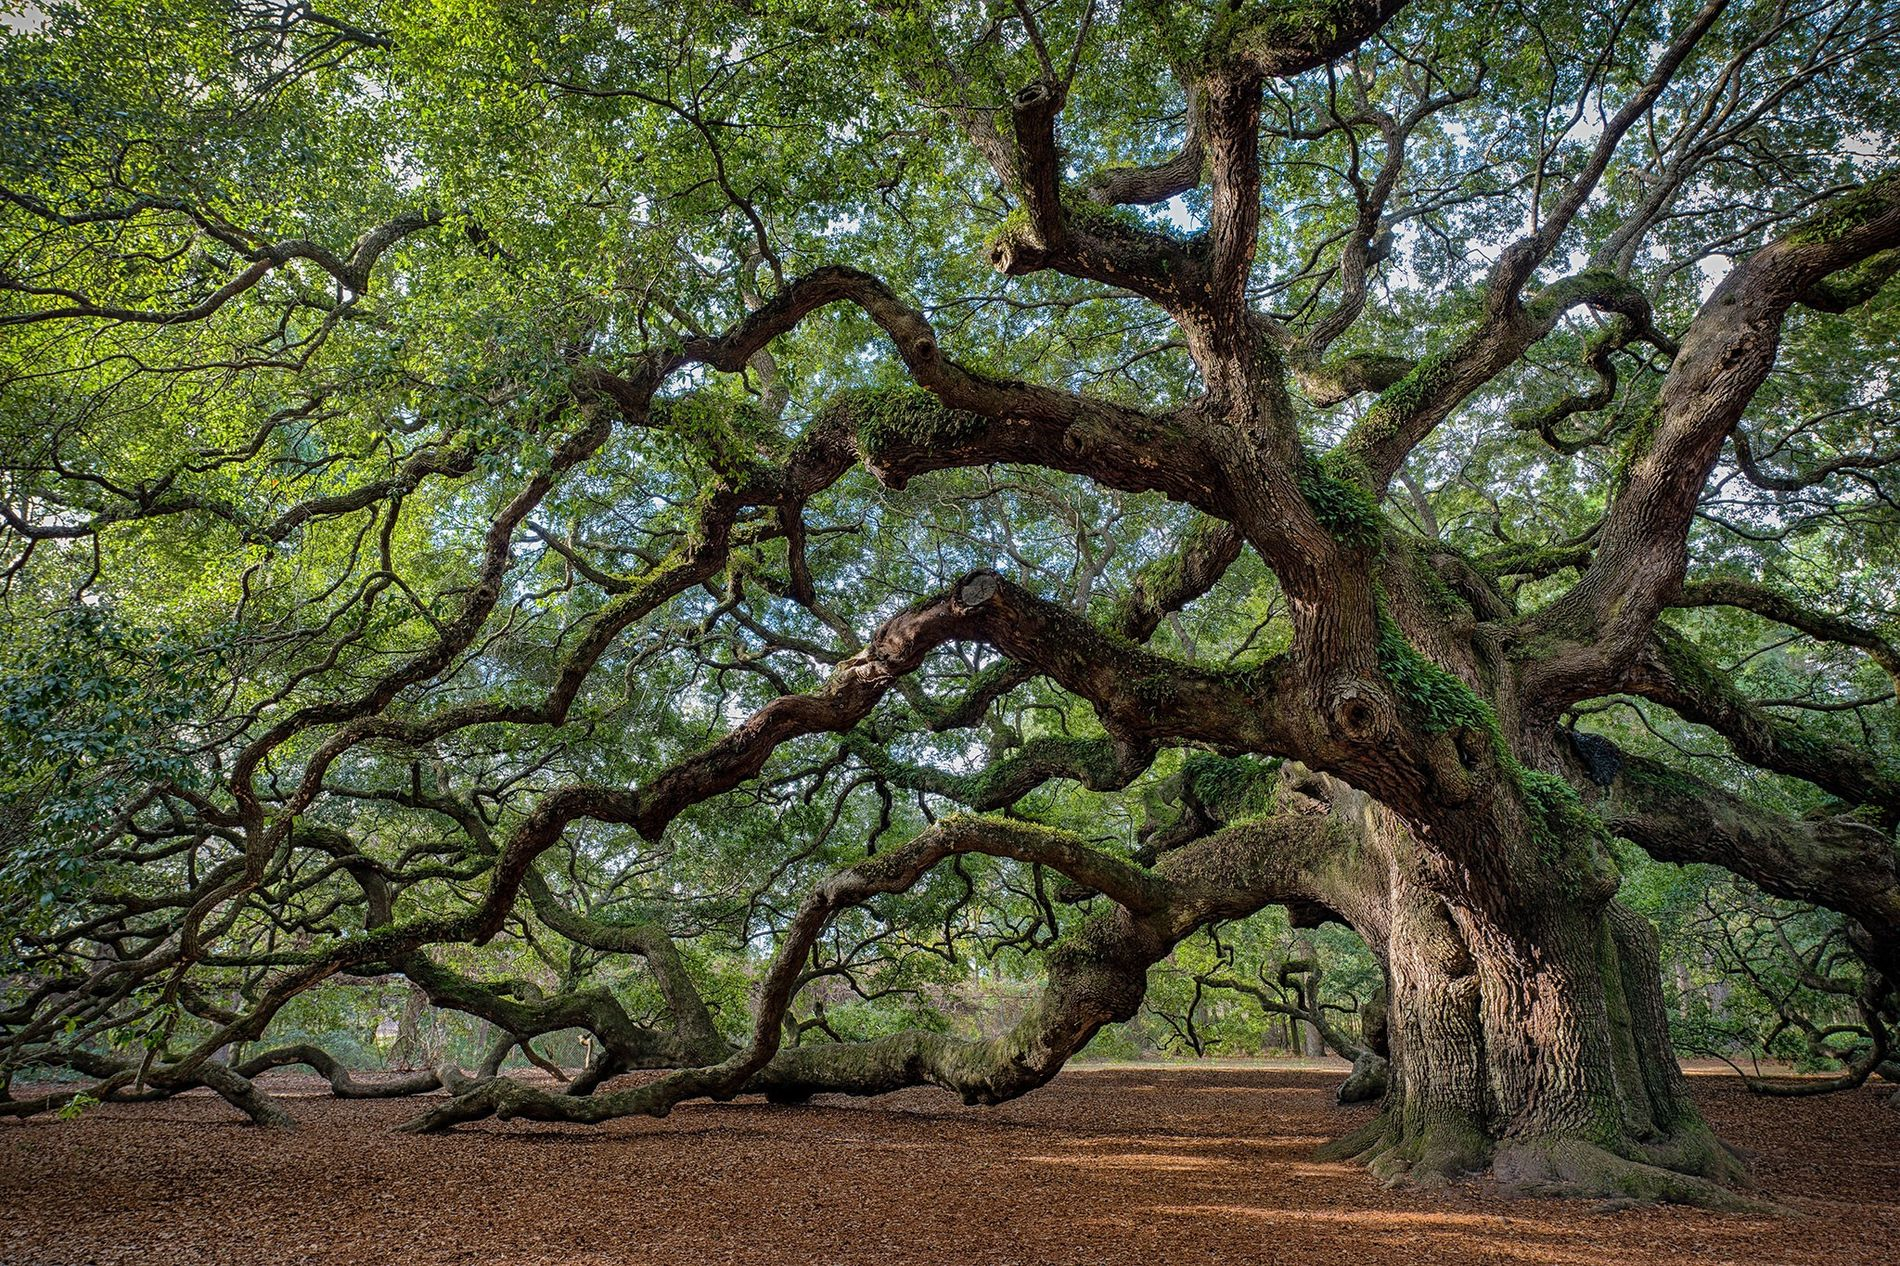 The World's Canopy: Celebrating Trees